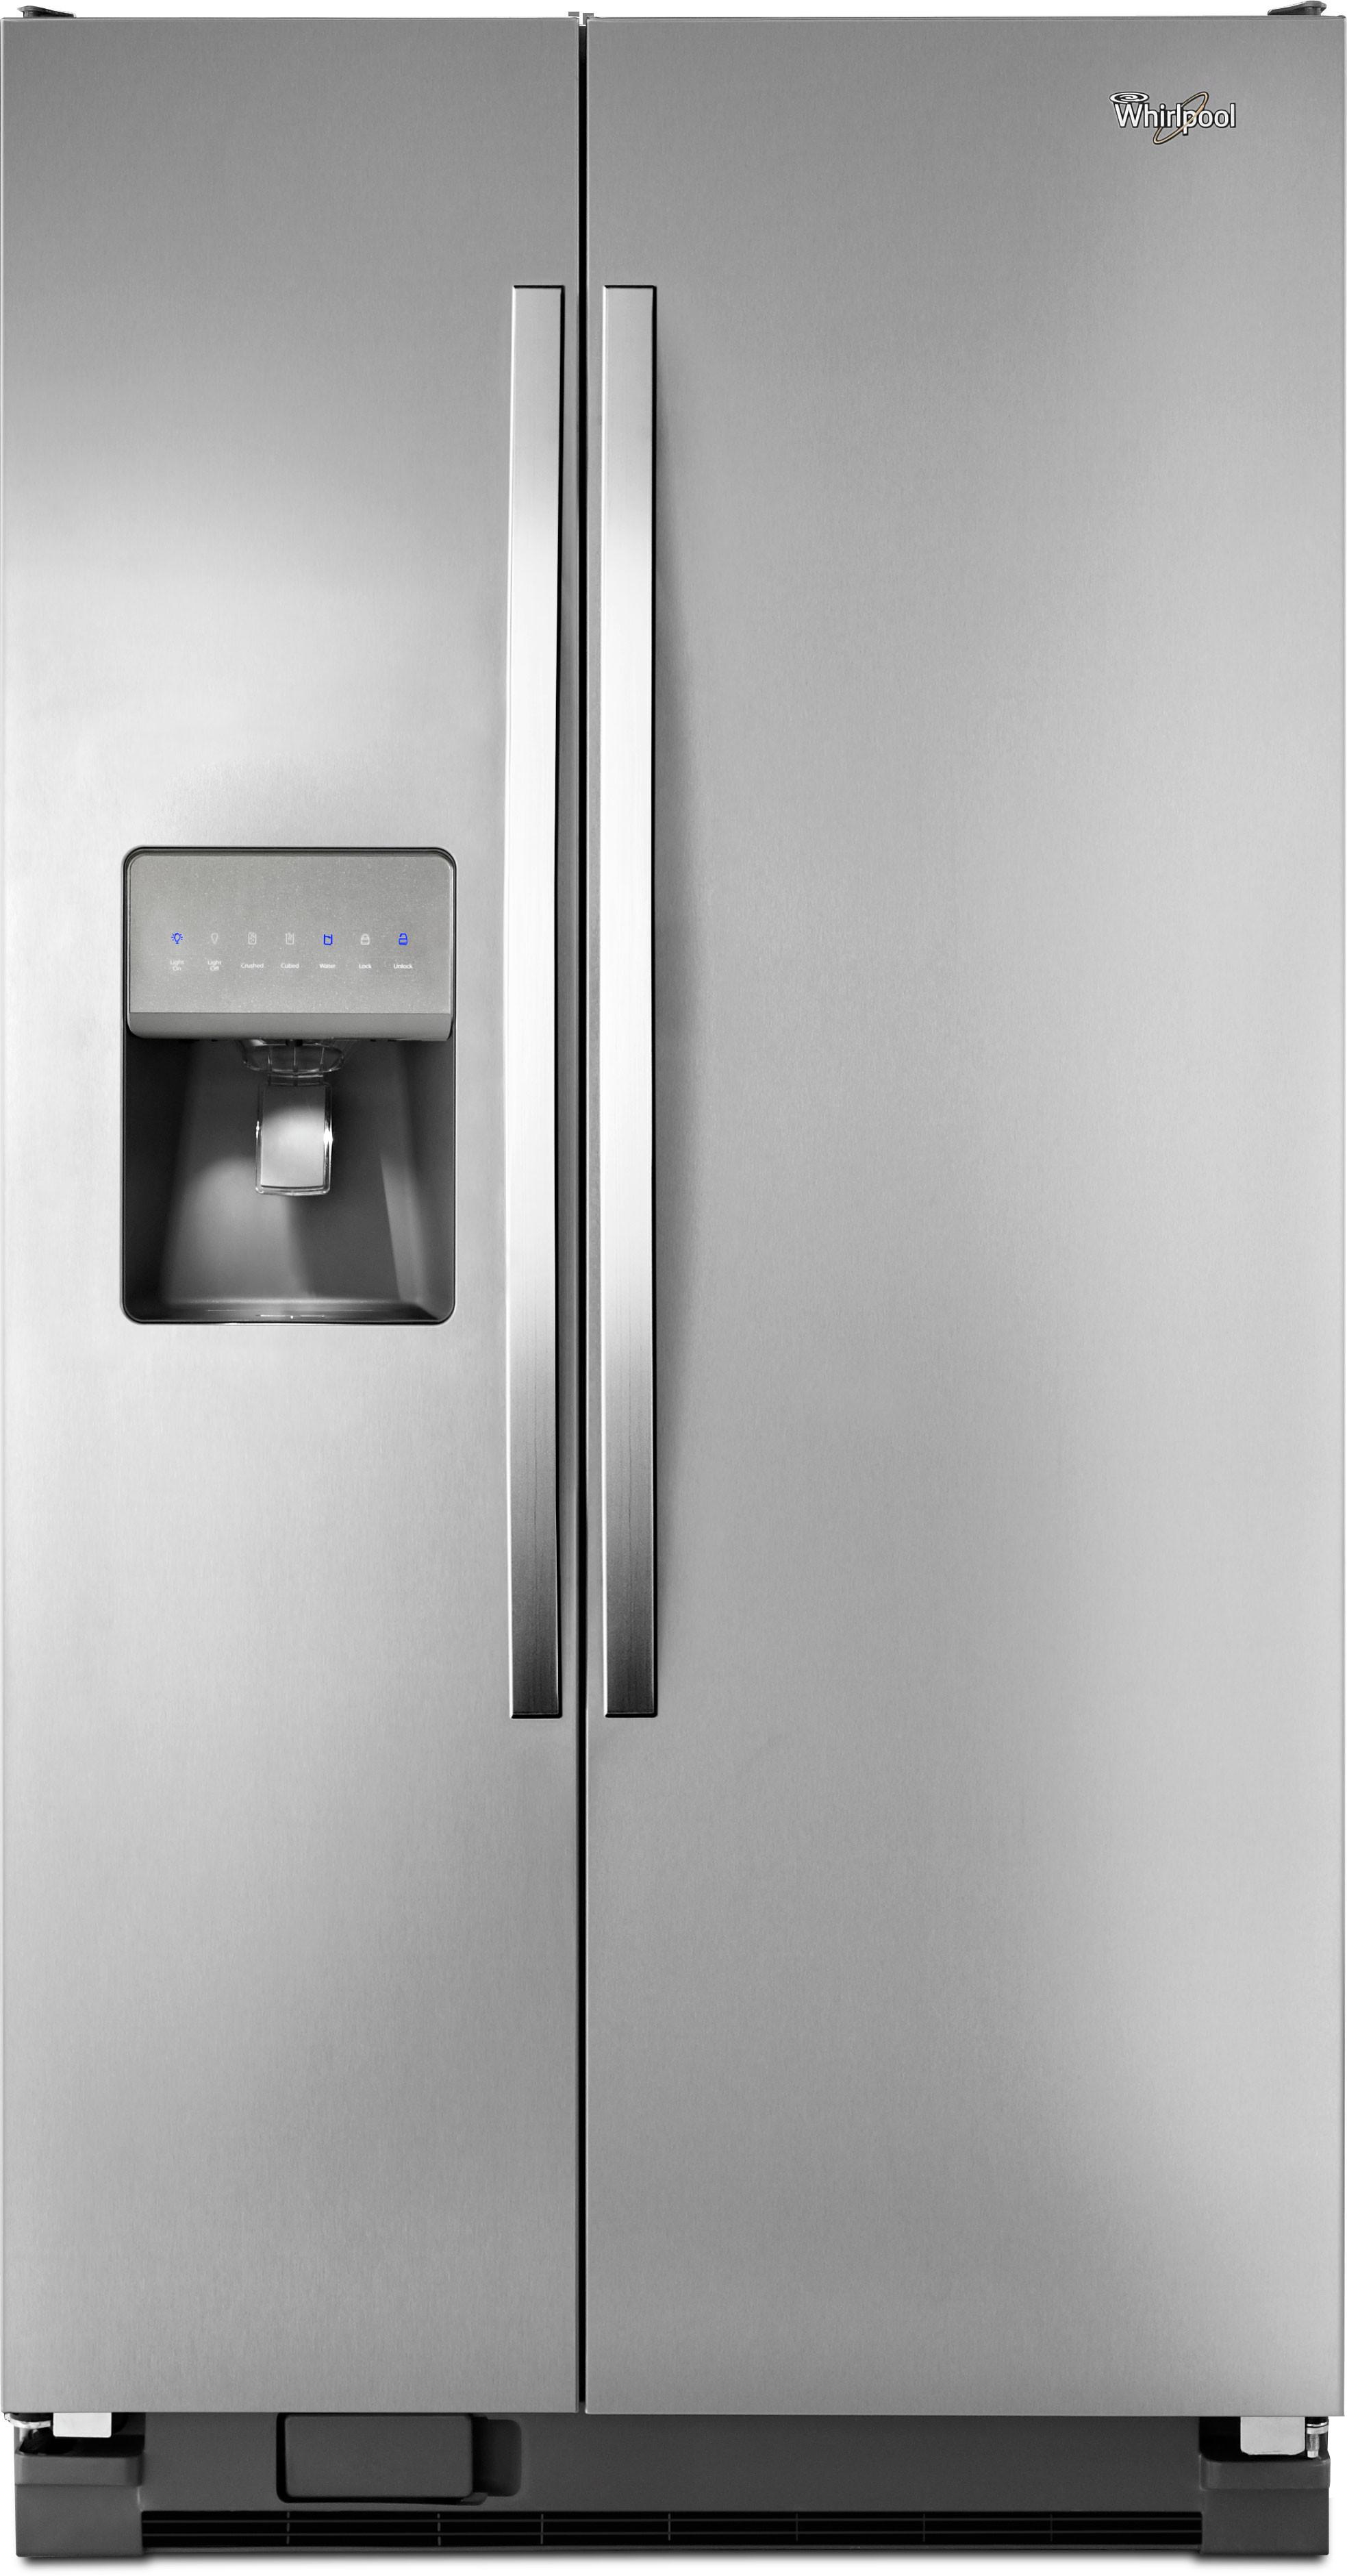 Whirlpool Wrs325fdam 36 Inch Side By Side Refrigerator